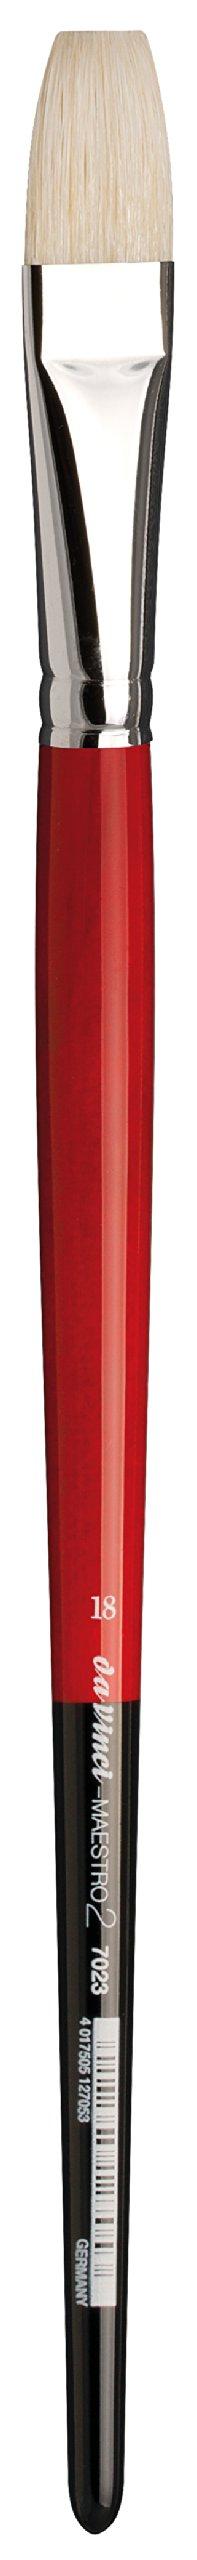 da Vinci Hog Bristle Series 7023 Maestro 2 Artist Paint Brush, Flat with European Sizing, Size 18